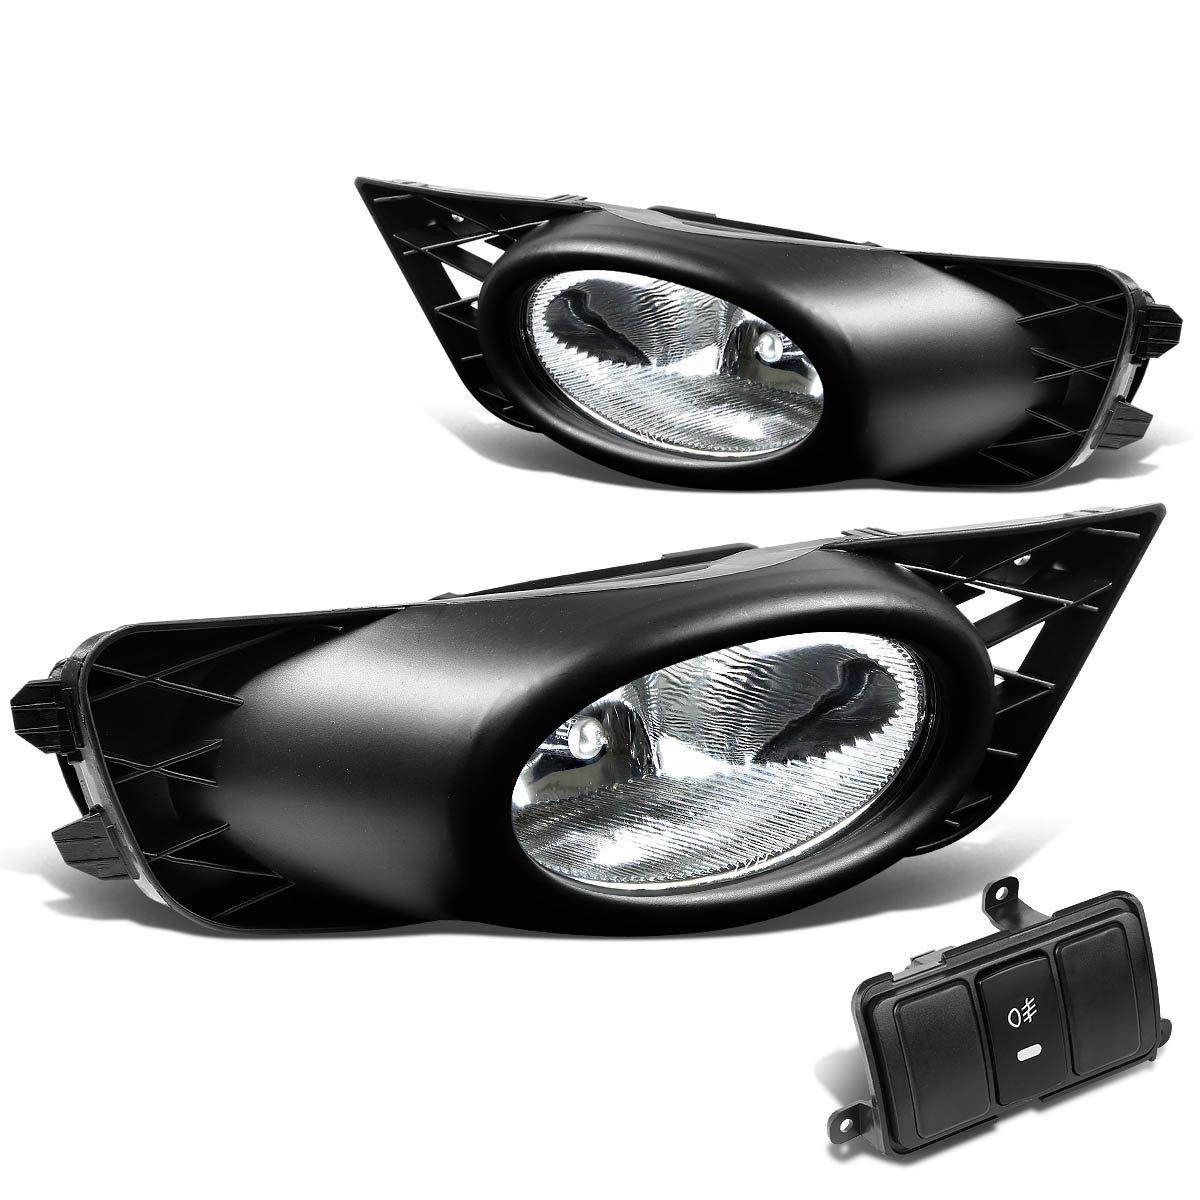 For Honda Civic Fa1 Sedan Pair Of Bumper Driving Fog Wiring Auxiliary Lights Jeep Kit Switch Bezel Chrome Lens Automotive